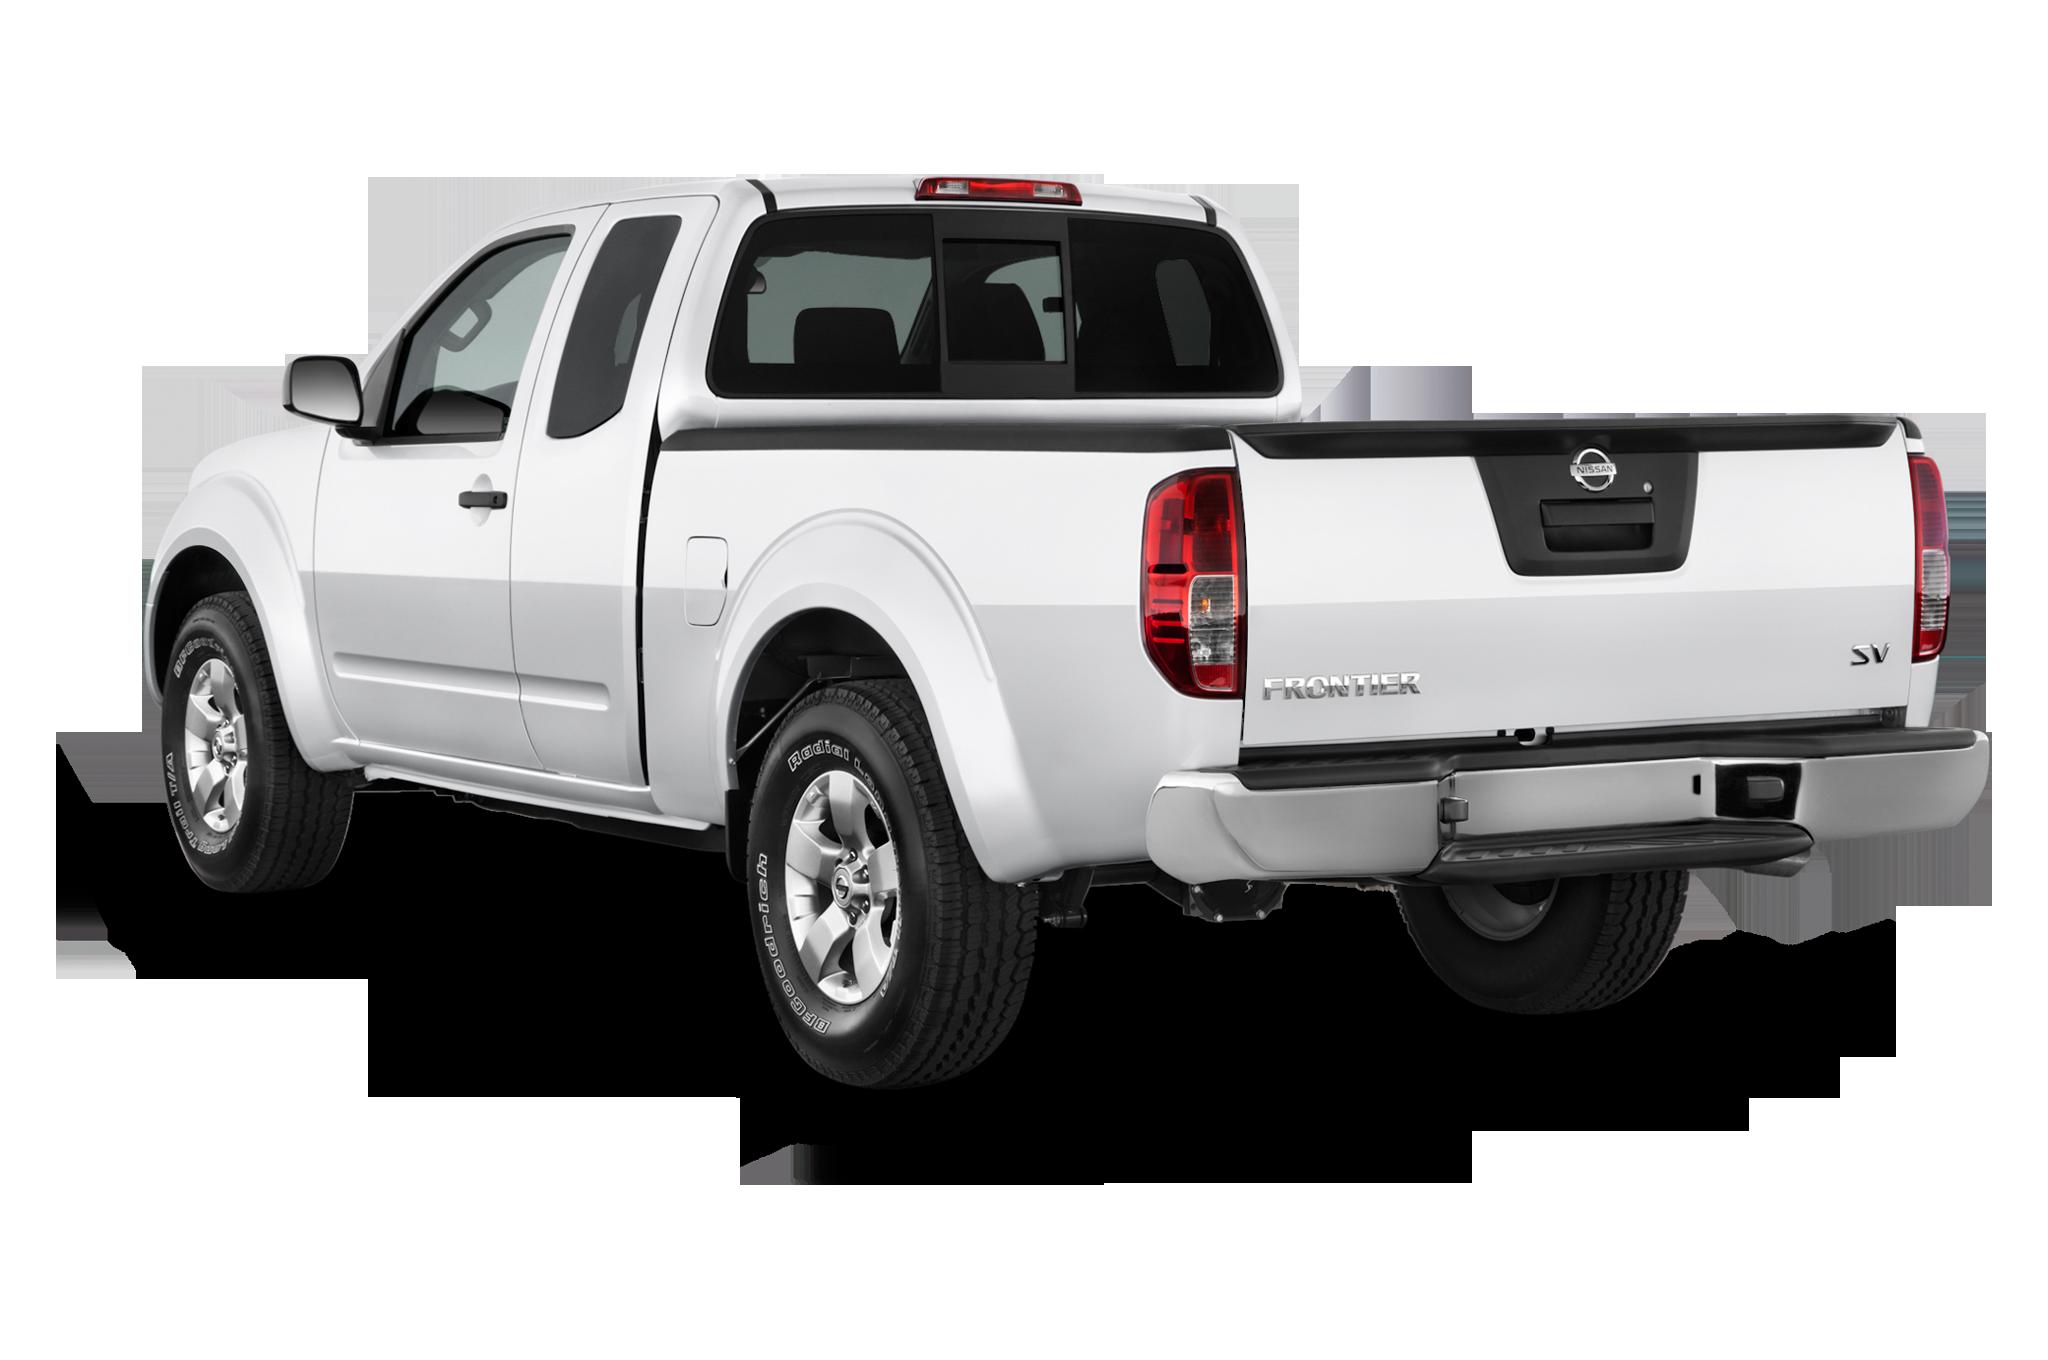 2013 Nissan Frontier PRO-4X Crew Cab - Automobile Magazine